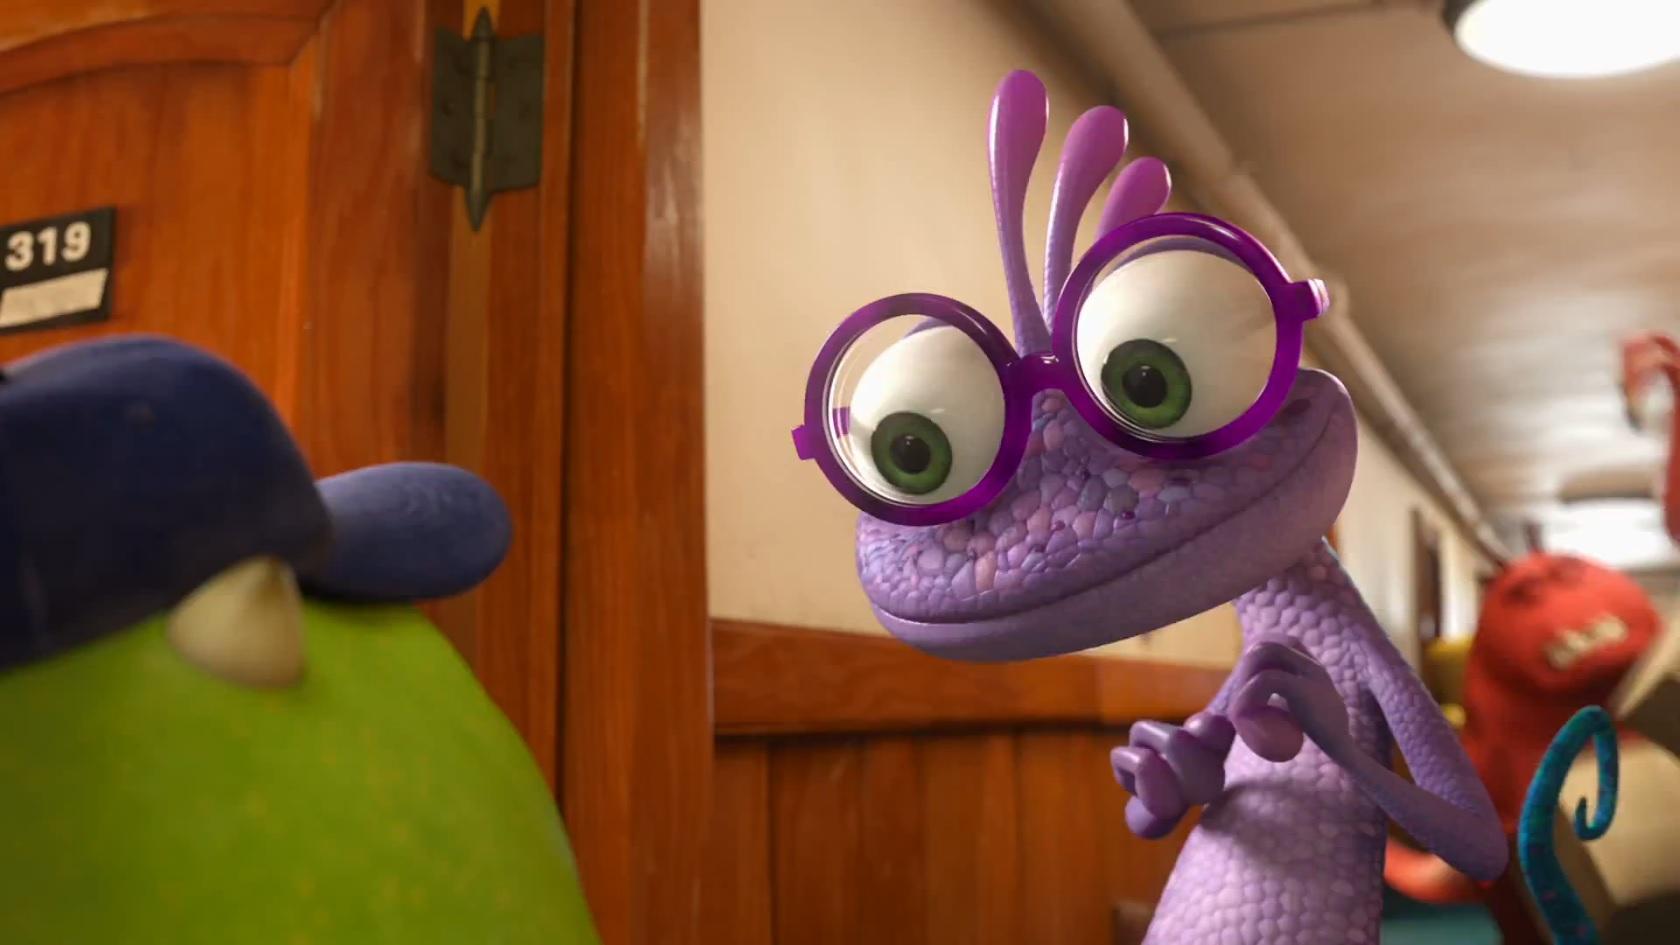 Randall meets Mike